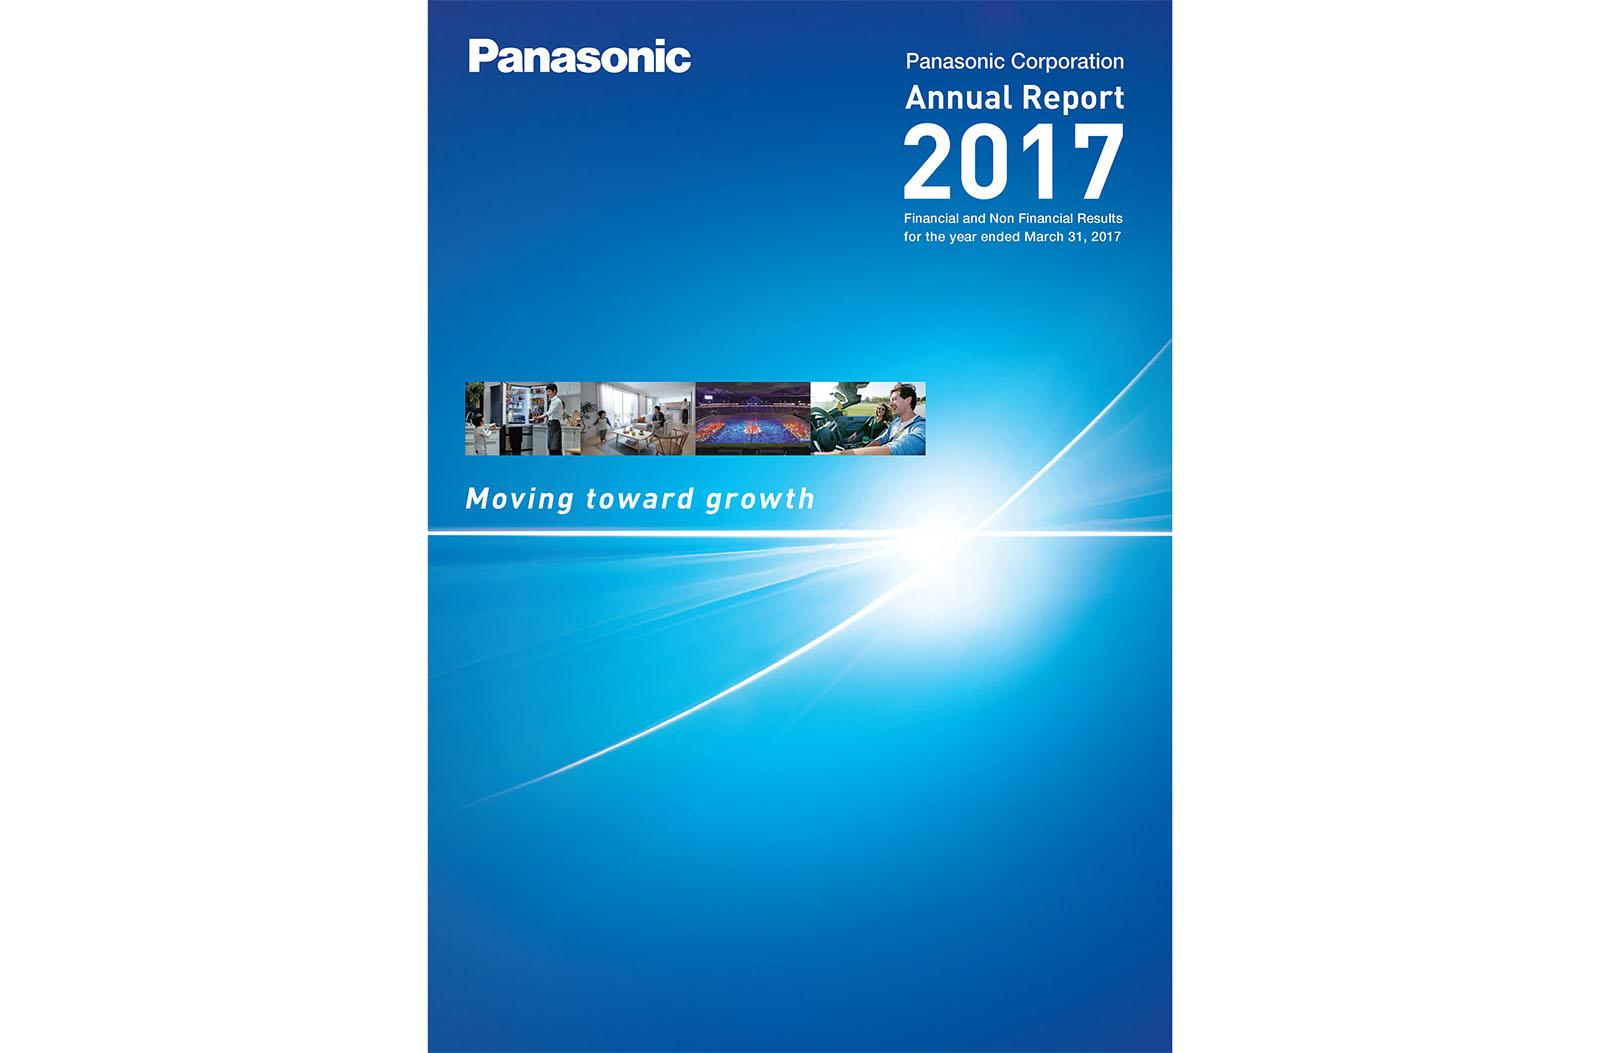 Image: Annual Report 2017